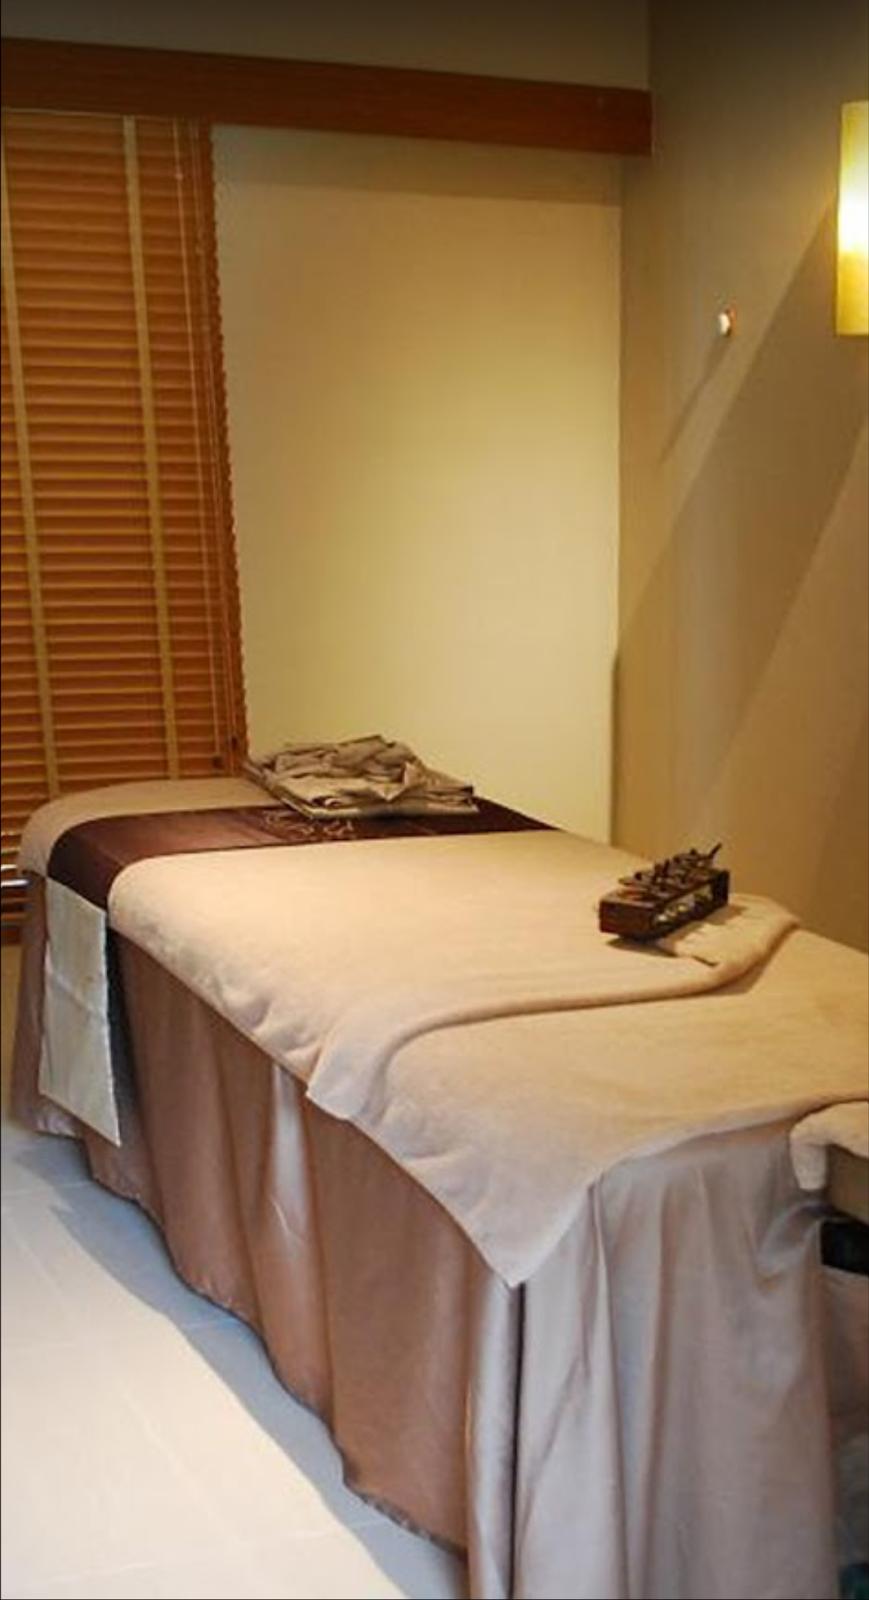 Blossom Health Center│Asian Massage - spa  | Photo 2 of 8 | Address: 990 A Street Suite J, San Rafael, CA 94901, USA | Phone: (415) 295-7667